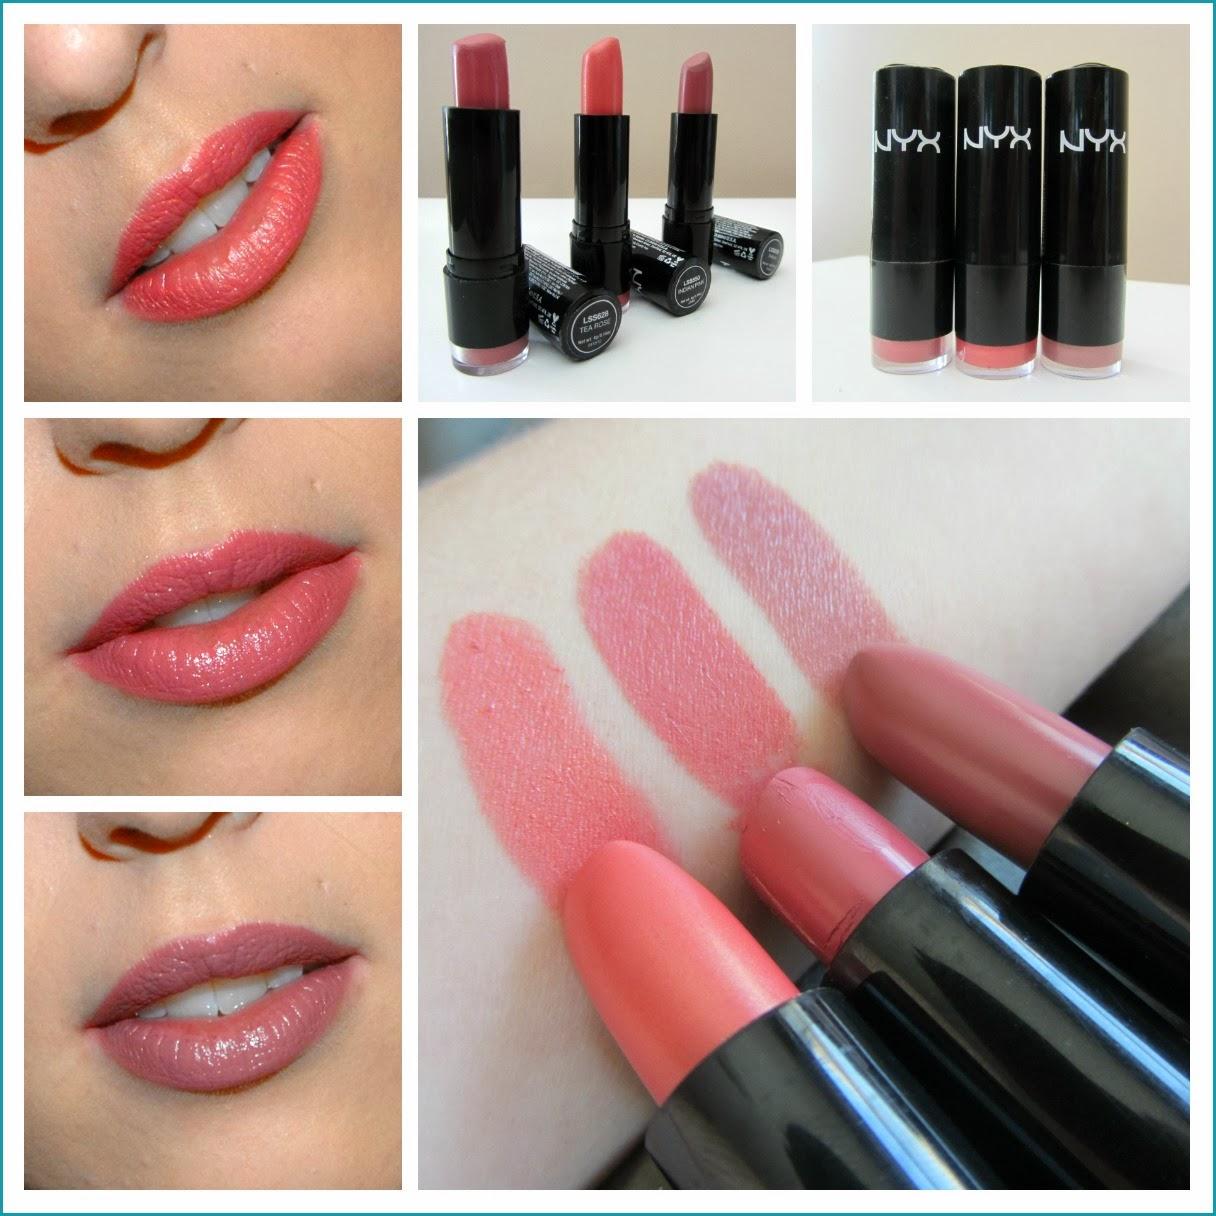 nyx round lipstick makeup review swatches nyx round